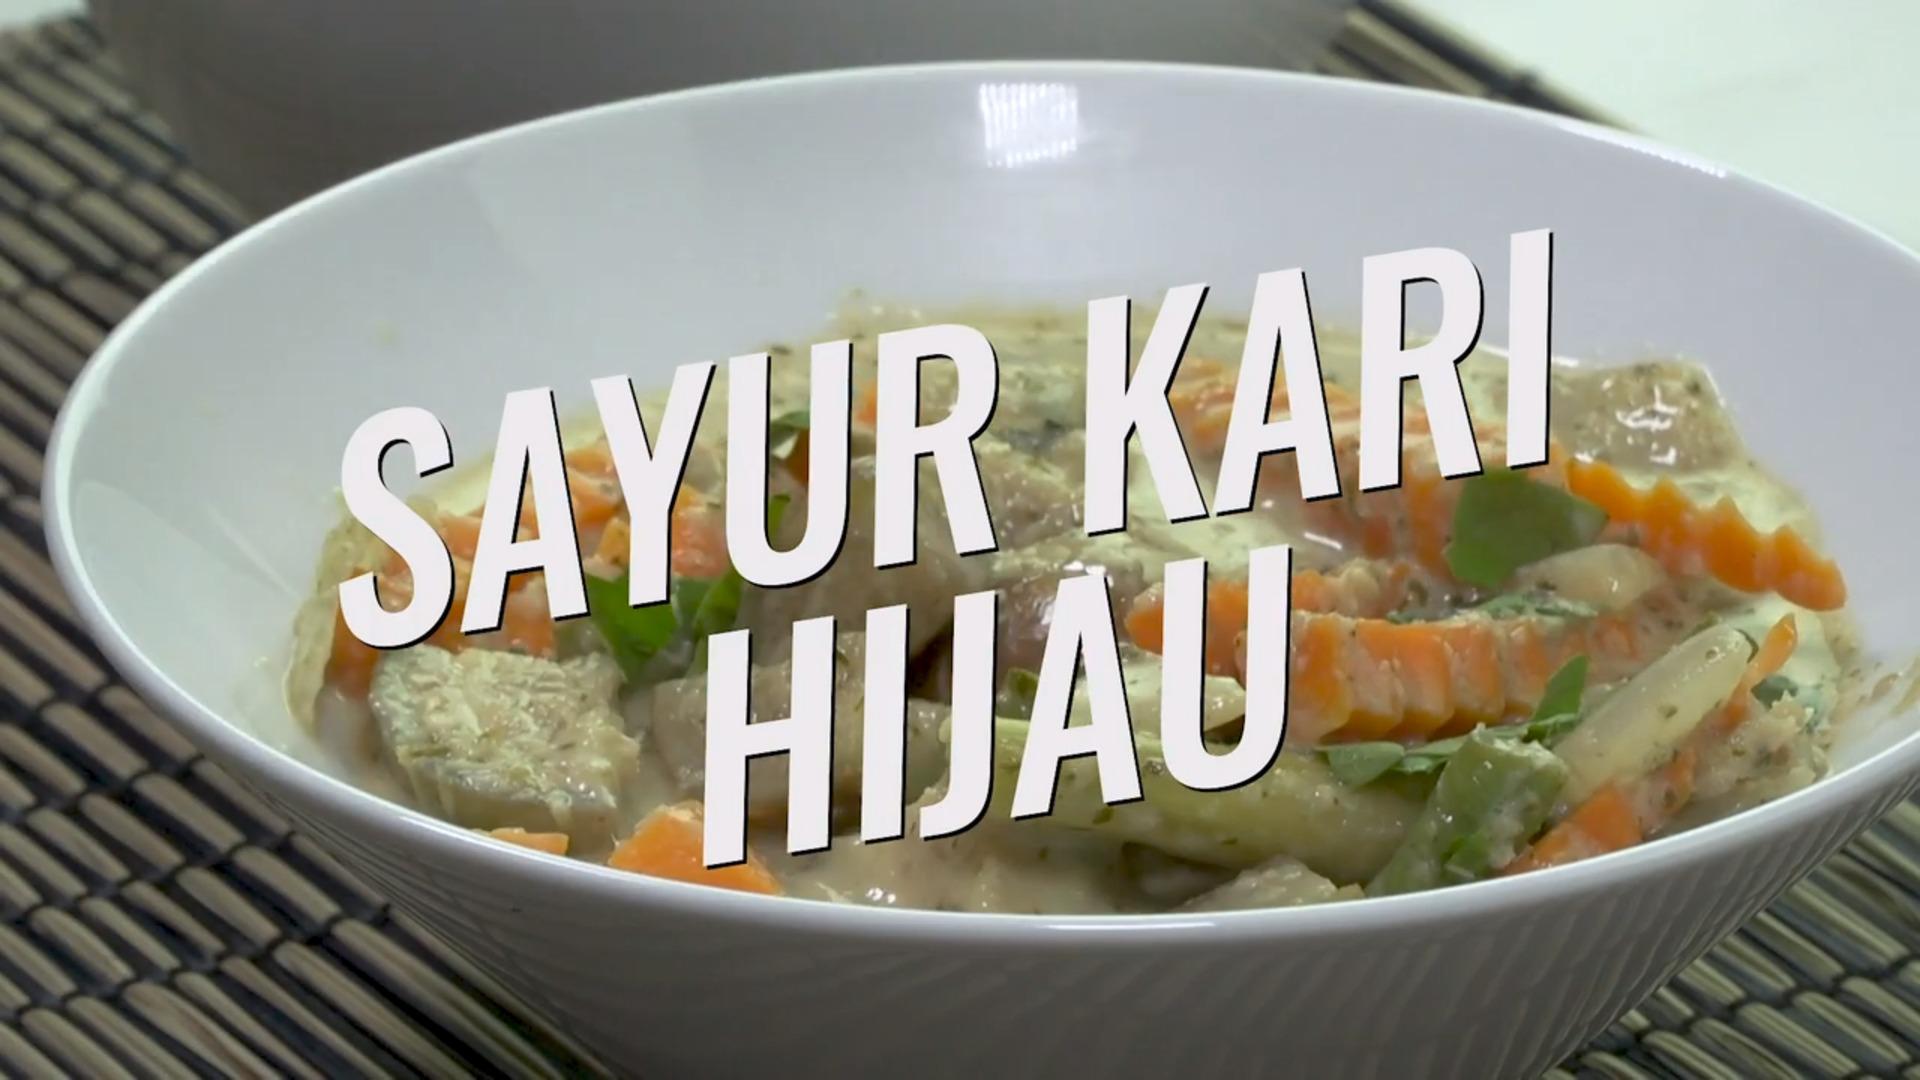 08 Sayur Kari Hijau Ready Set Cook Malay